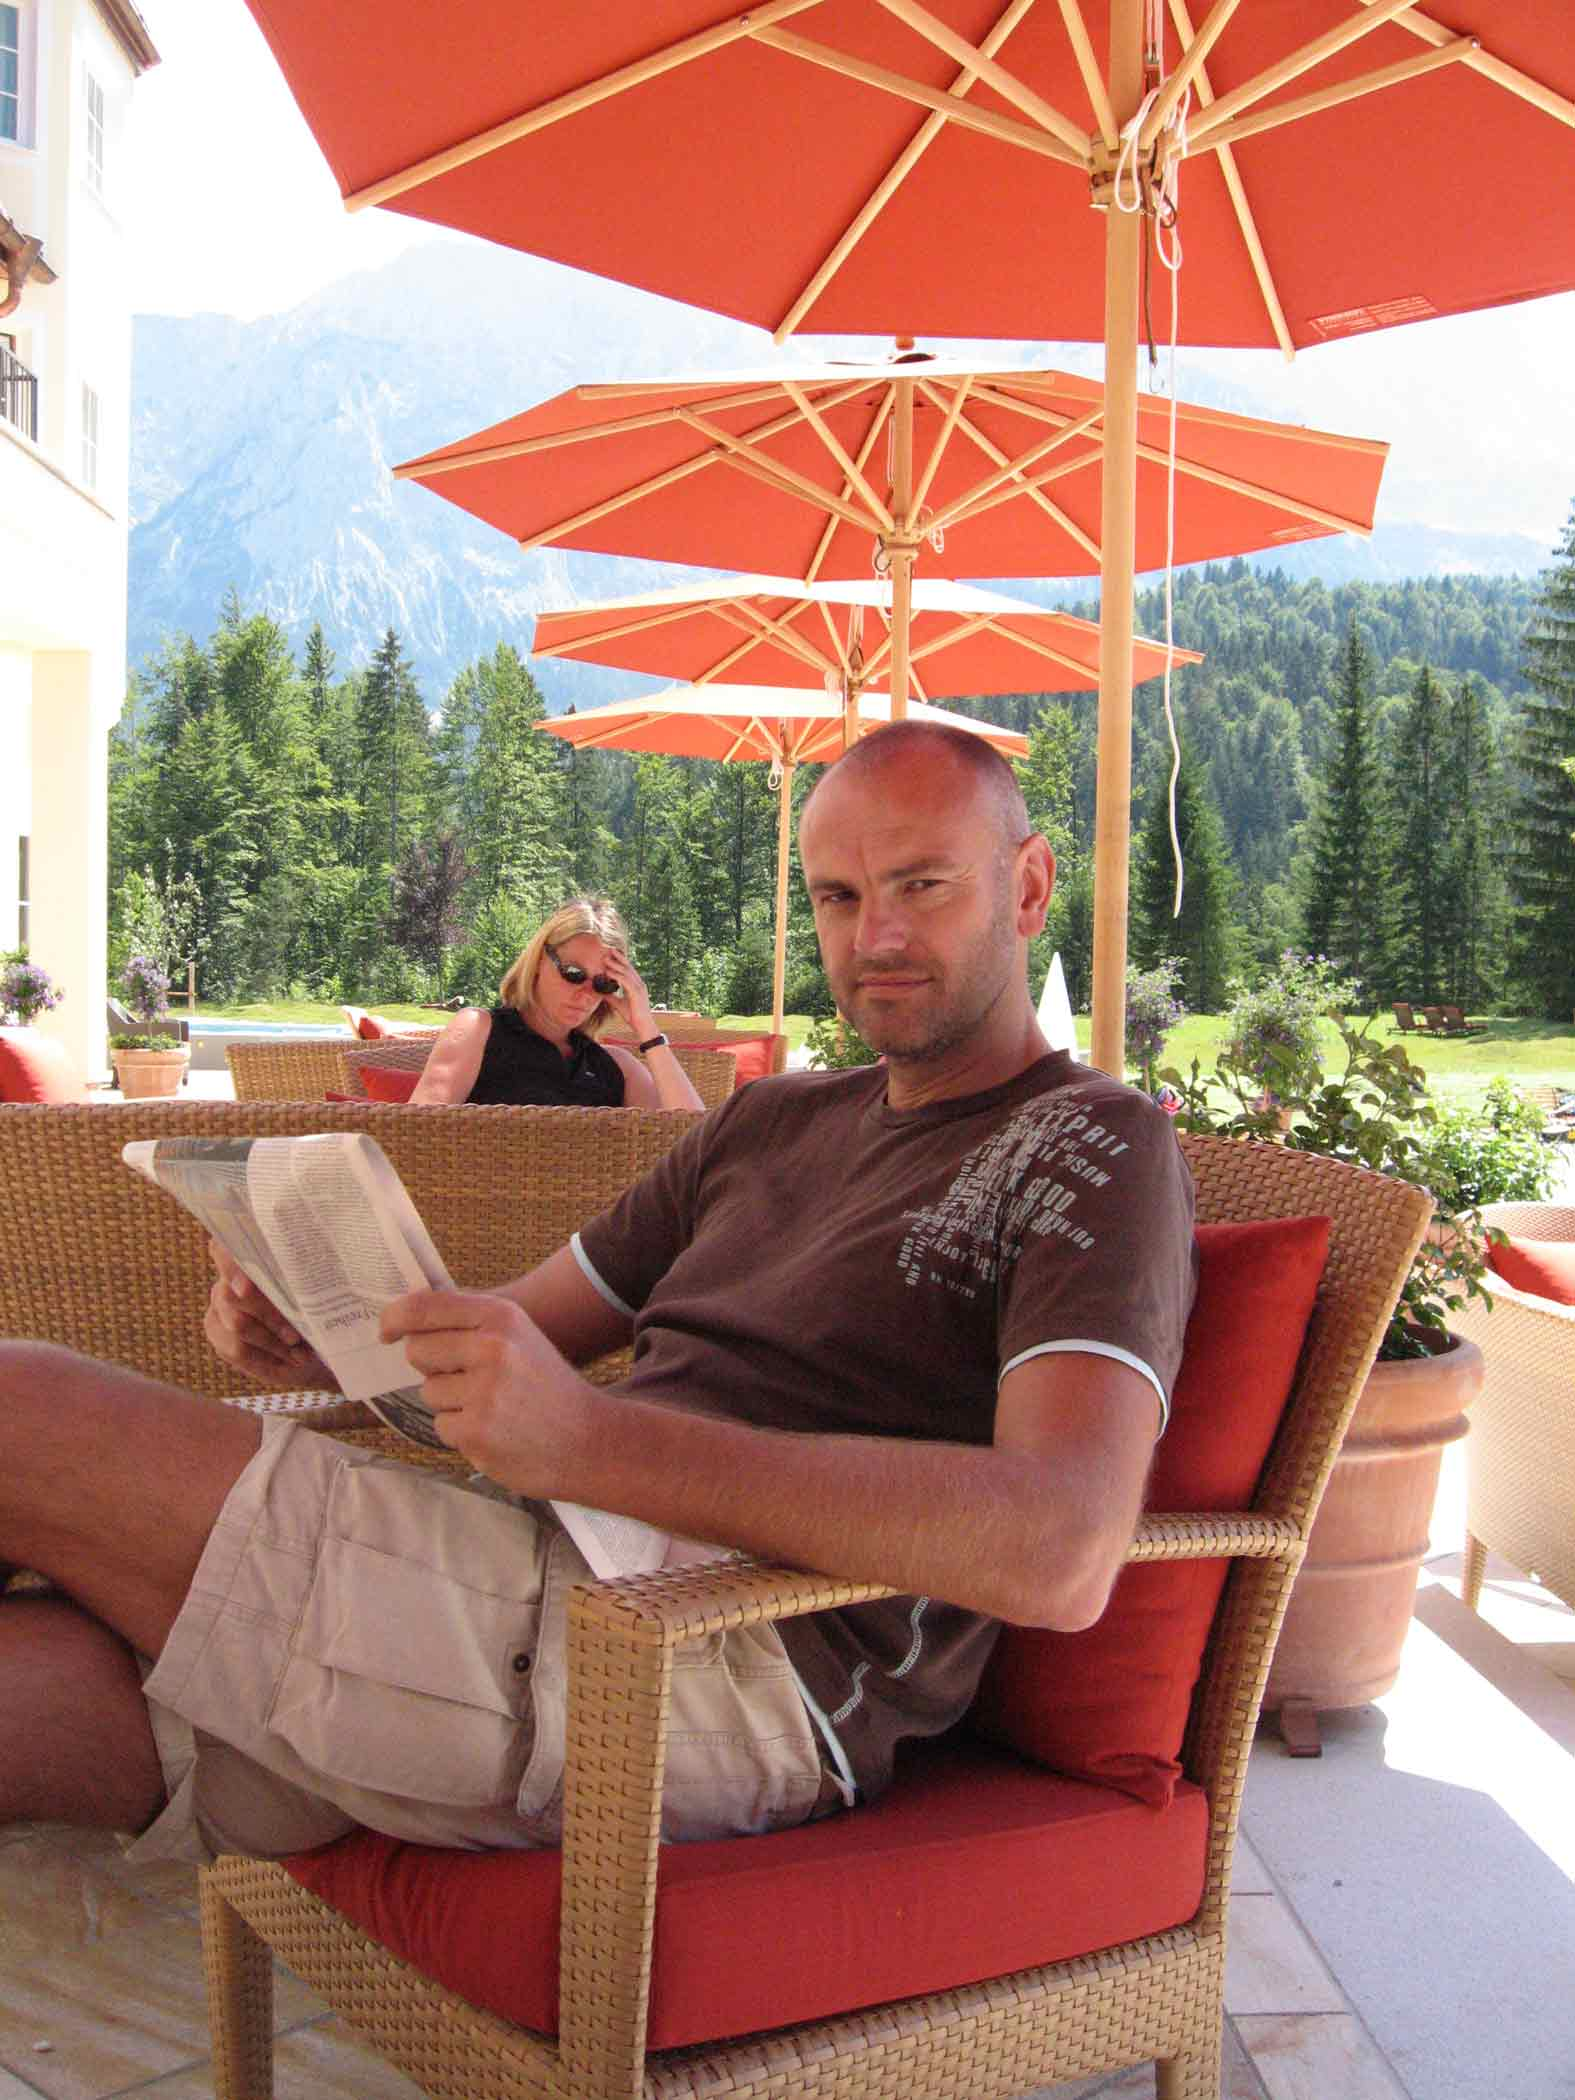 Reisejournalist Ralf Nestmeyer im Hotel Schloss Elmau © Ralf Nestmeyer